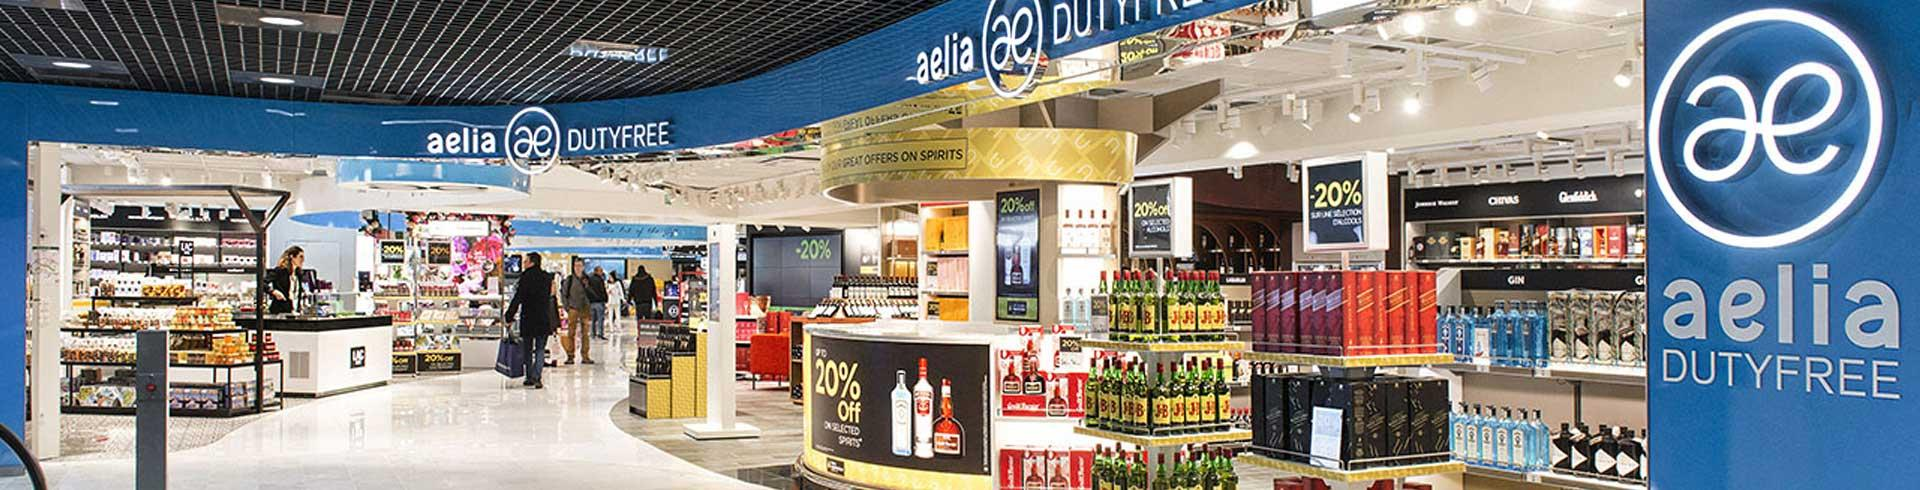 Aelia Duty Free   Liquor   Perfumes   Terminal 2   Shops   Services ... 6dc9842607